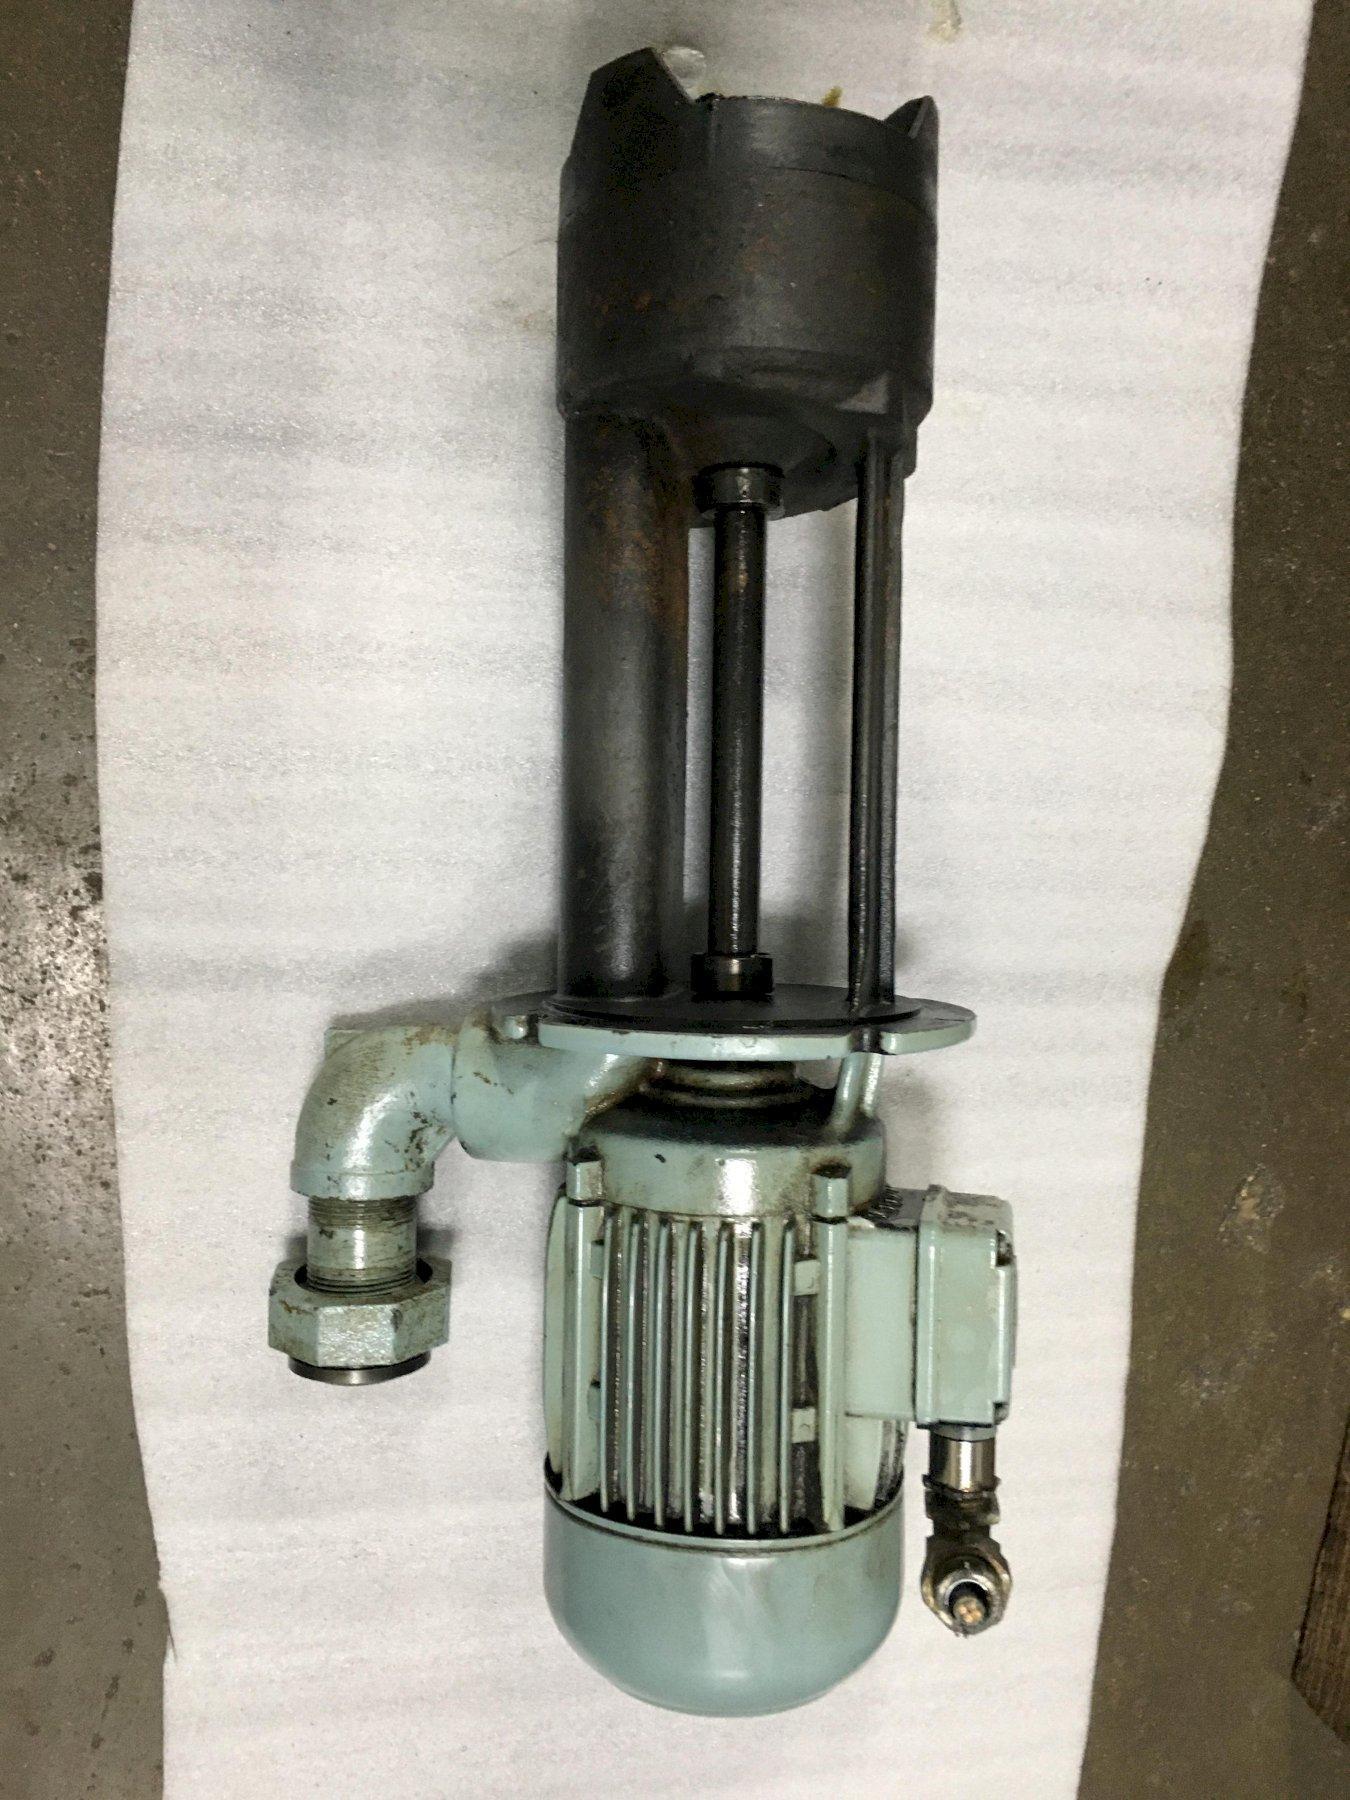 BRINKMANN IMMERSION PUMP, Model TA302S320, 40 GPM 1.5HP, 230/460, 3200 RPM.